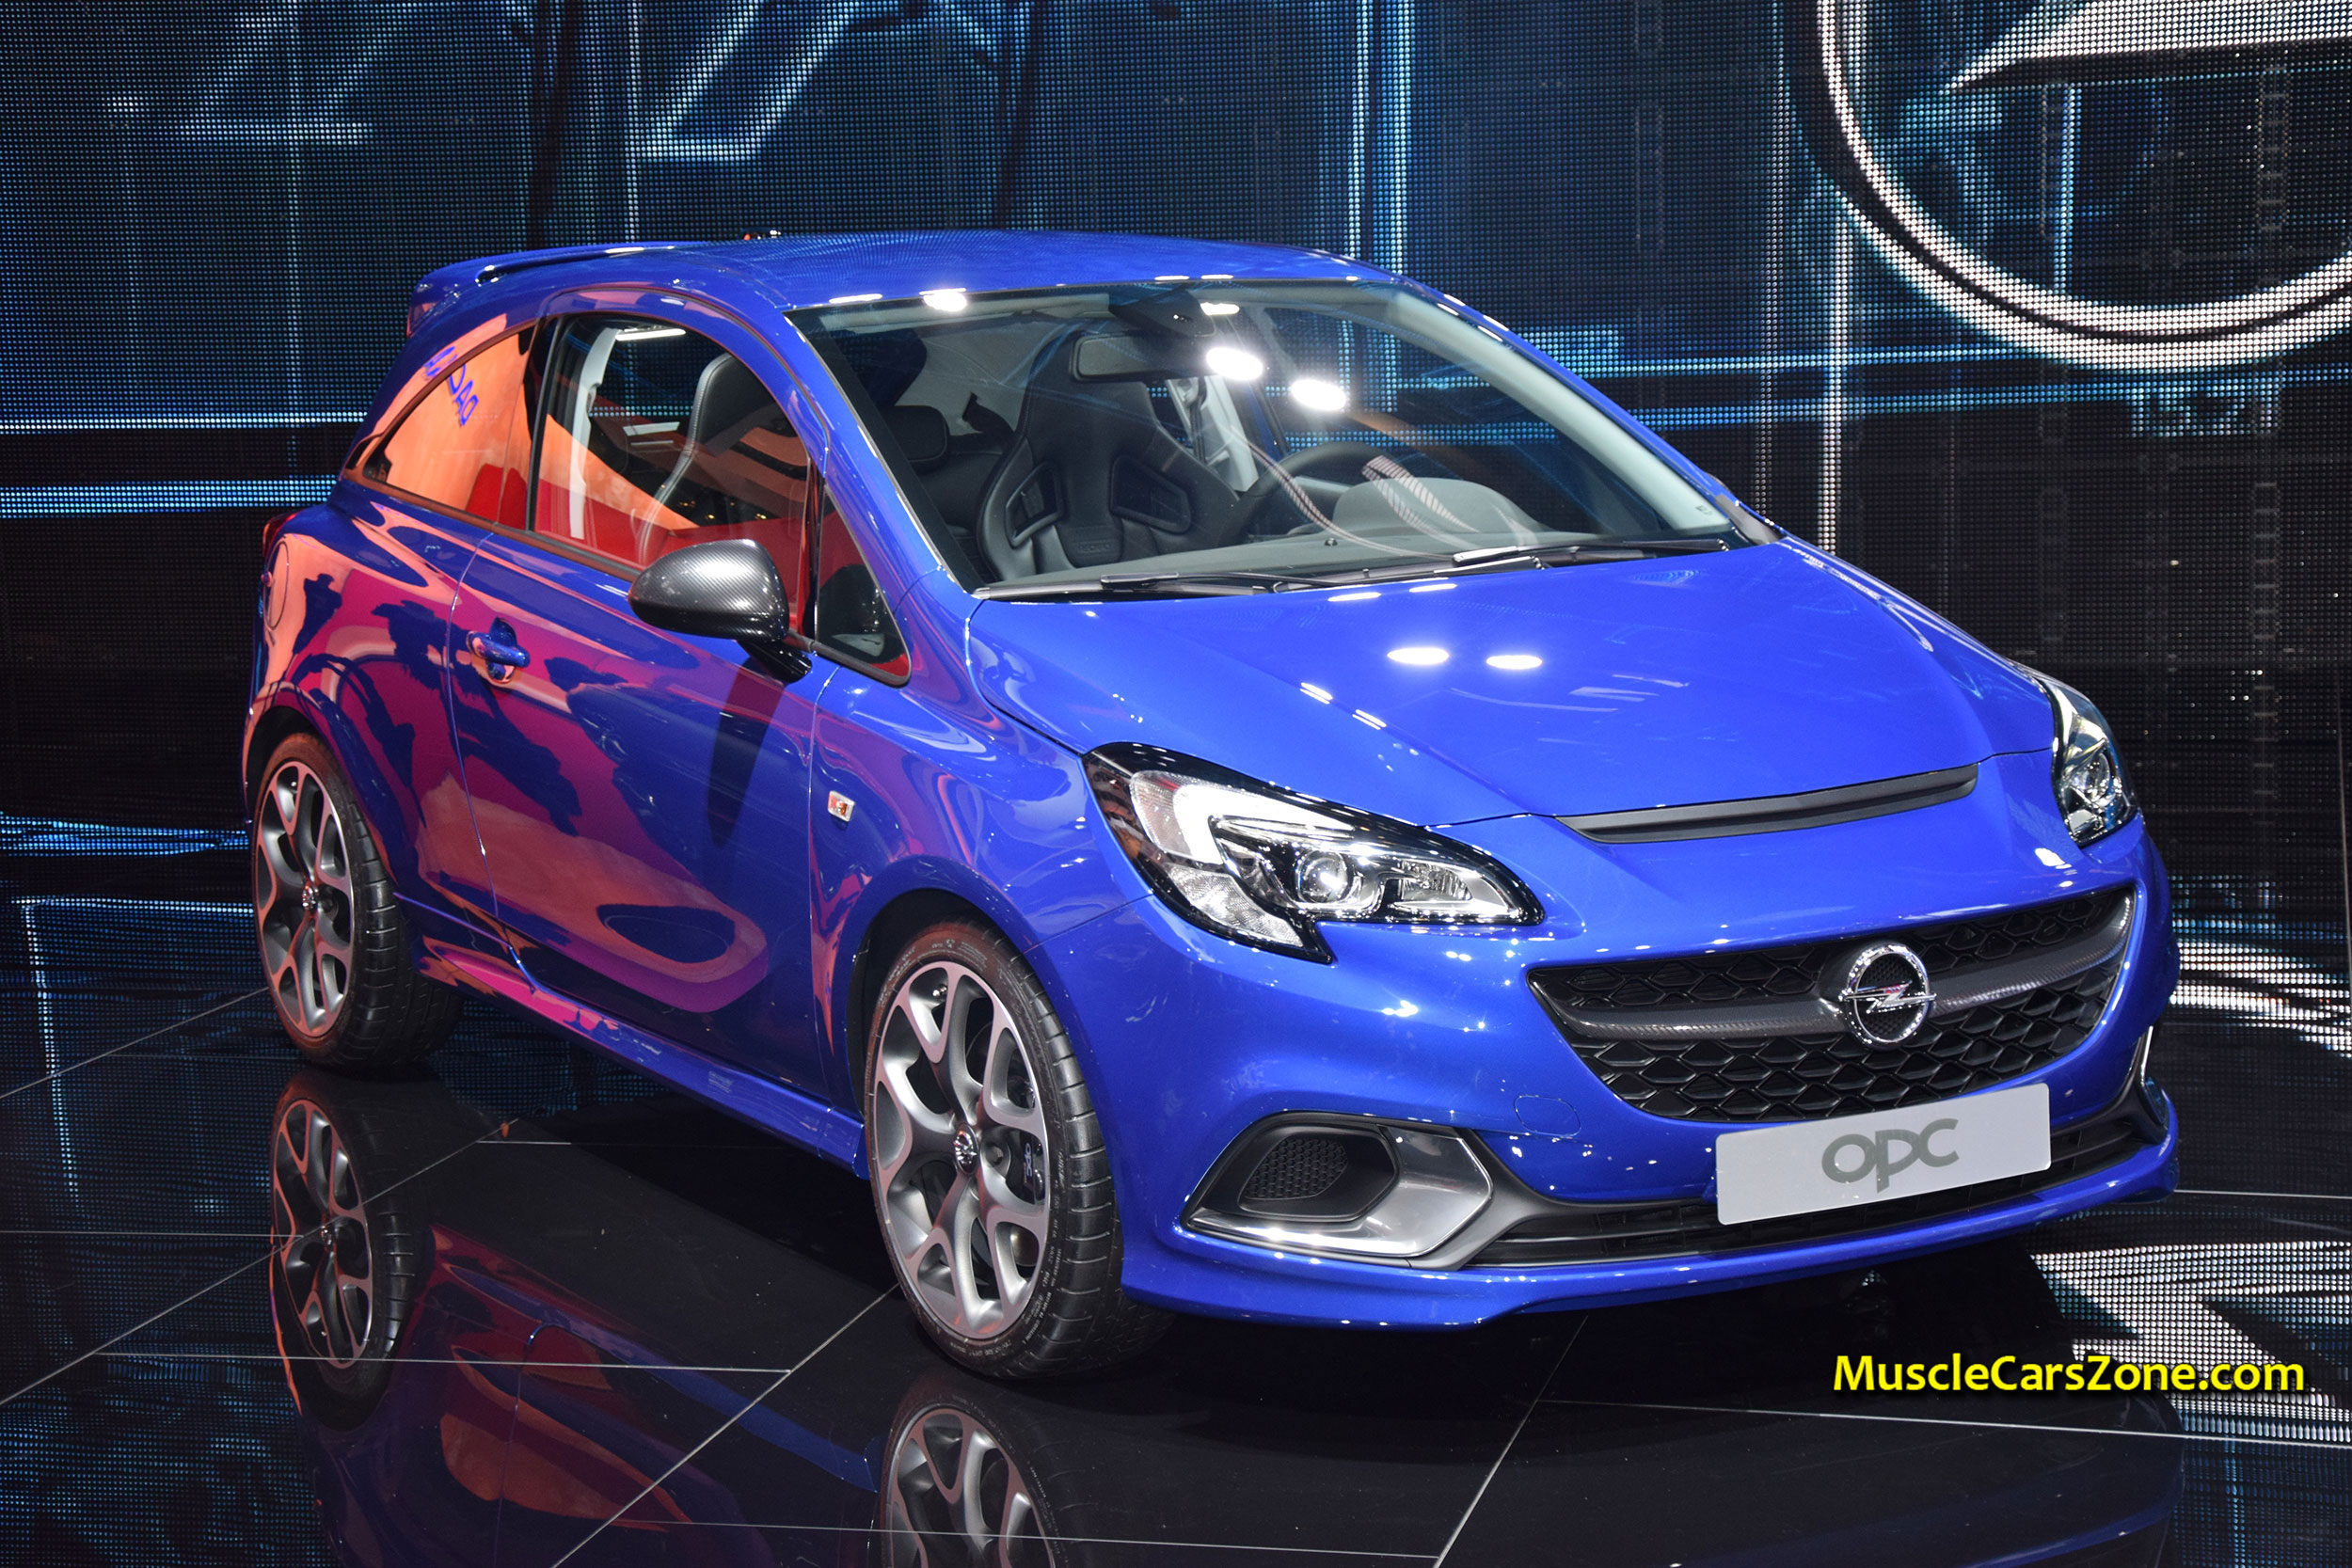 2015-Opel-Corsa-OPC-02---2015-Geneva-Motor-Show.JPG